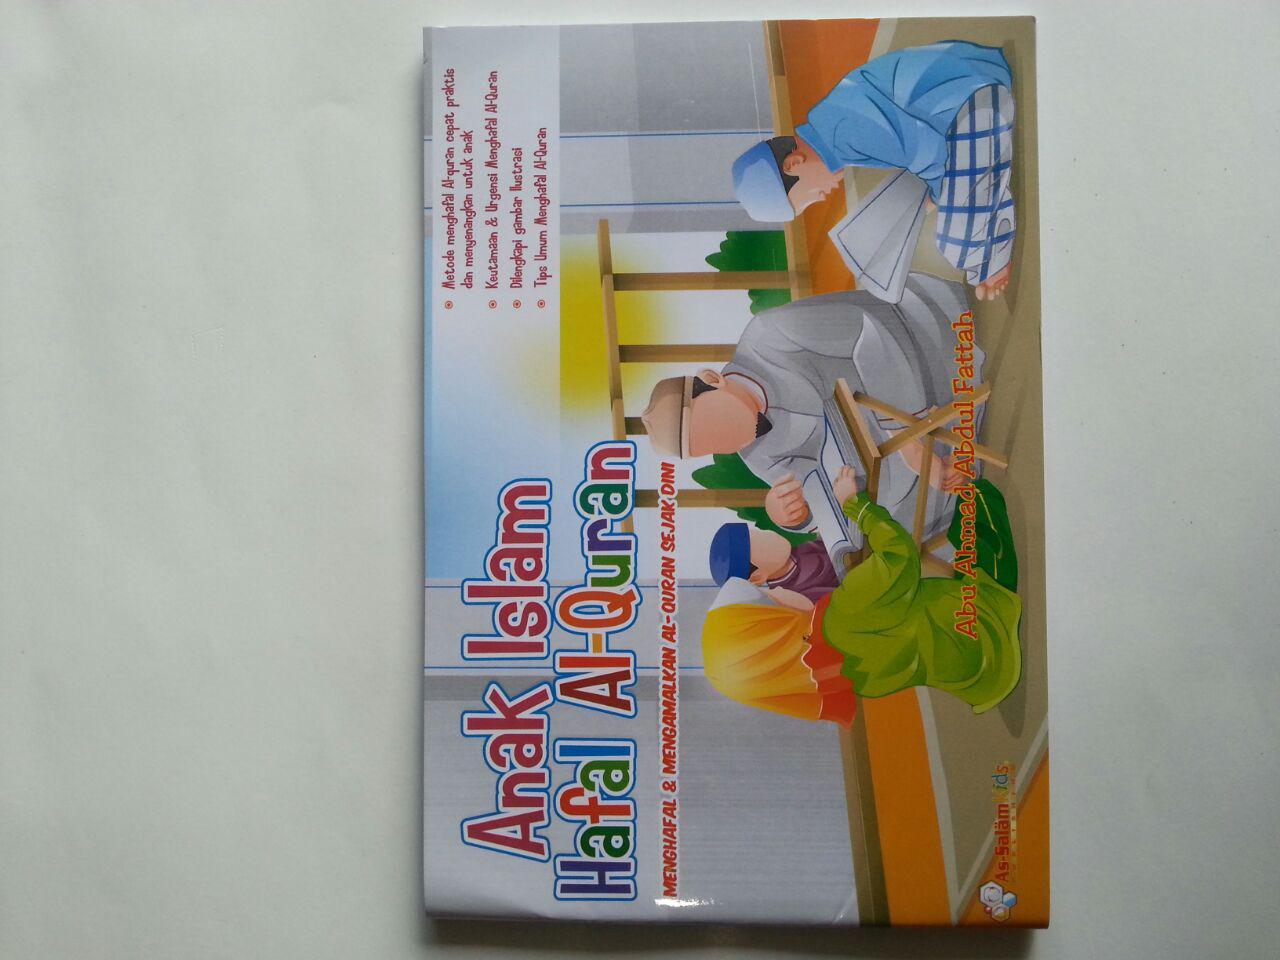 Buku Anak Islam Hafal Al-Quran Sejak Dini cover 2